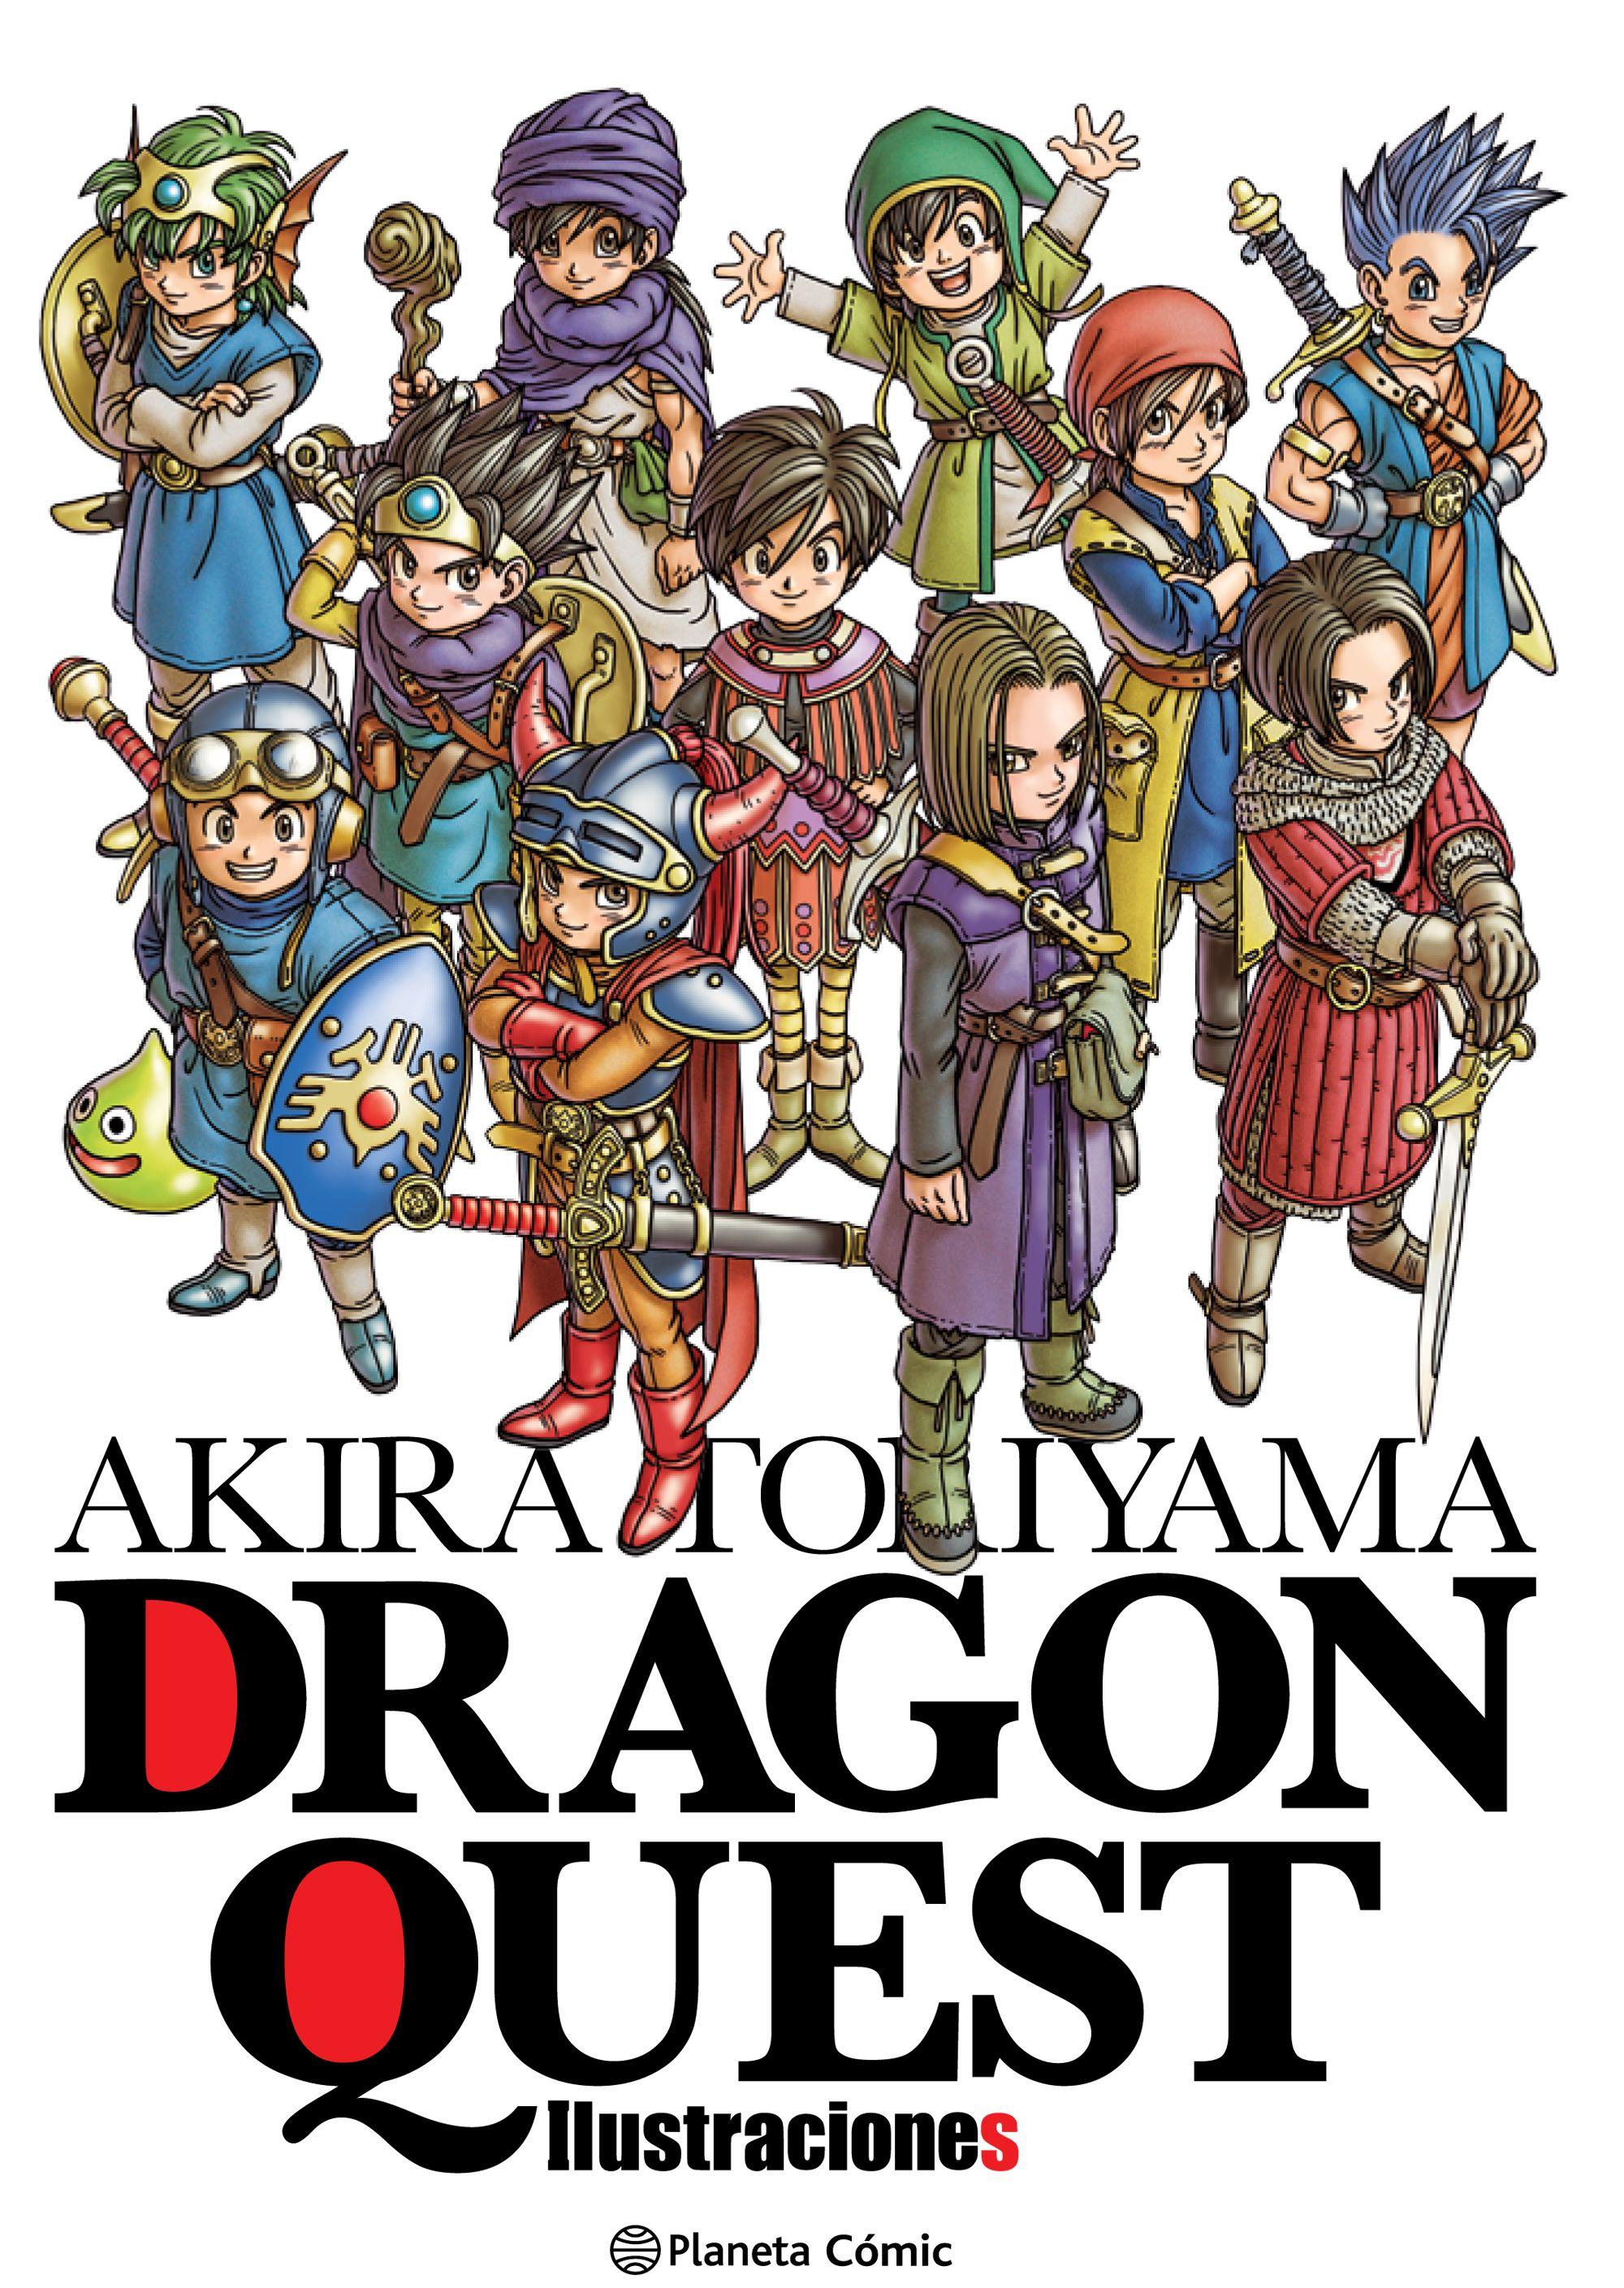 Post oficial - Los mangas de Dragon Quest Portada_dragon-quest-akira-toriyama-ilustraciones_akira-toriyama_201805221559